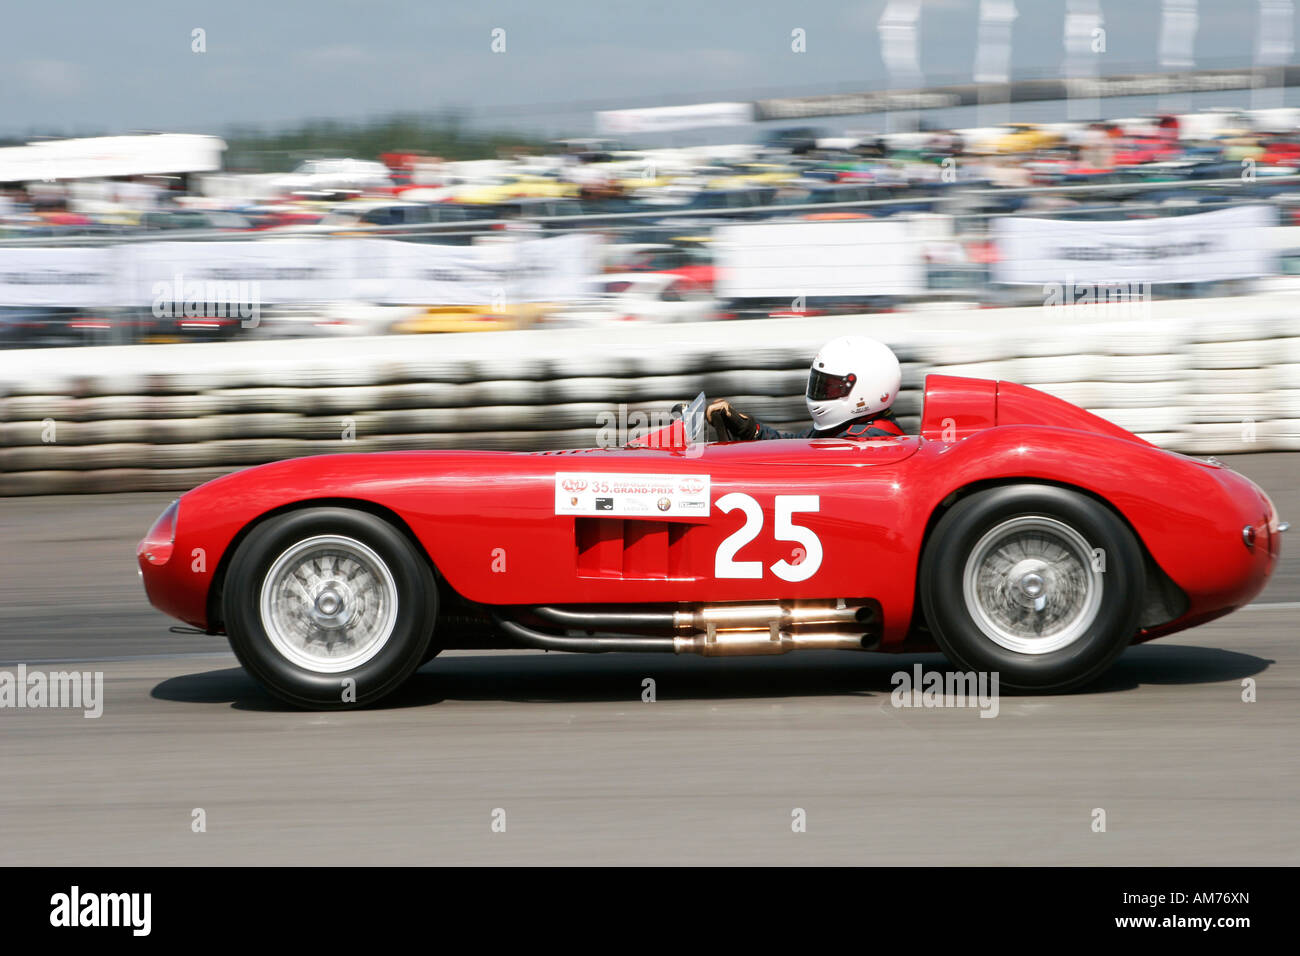 Maserati 300s Year Of Construction 1955 56 Vintage Cars Grand Prix